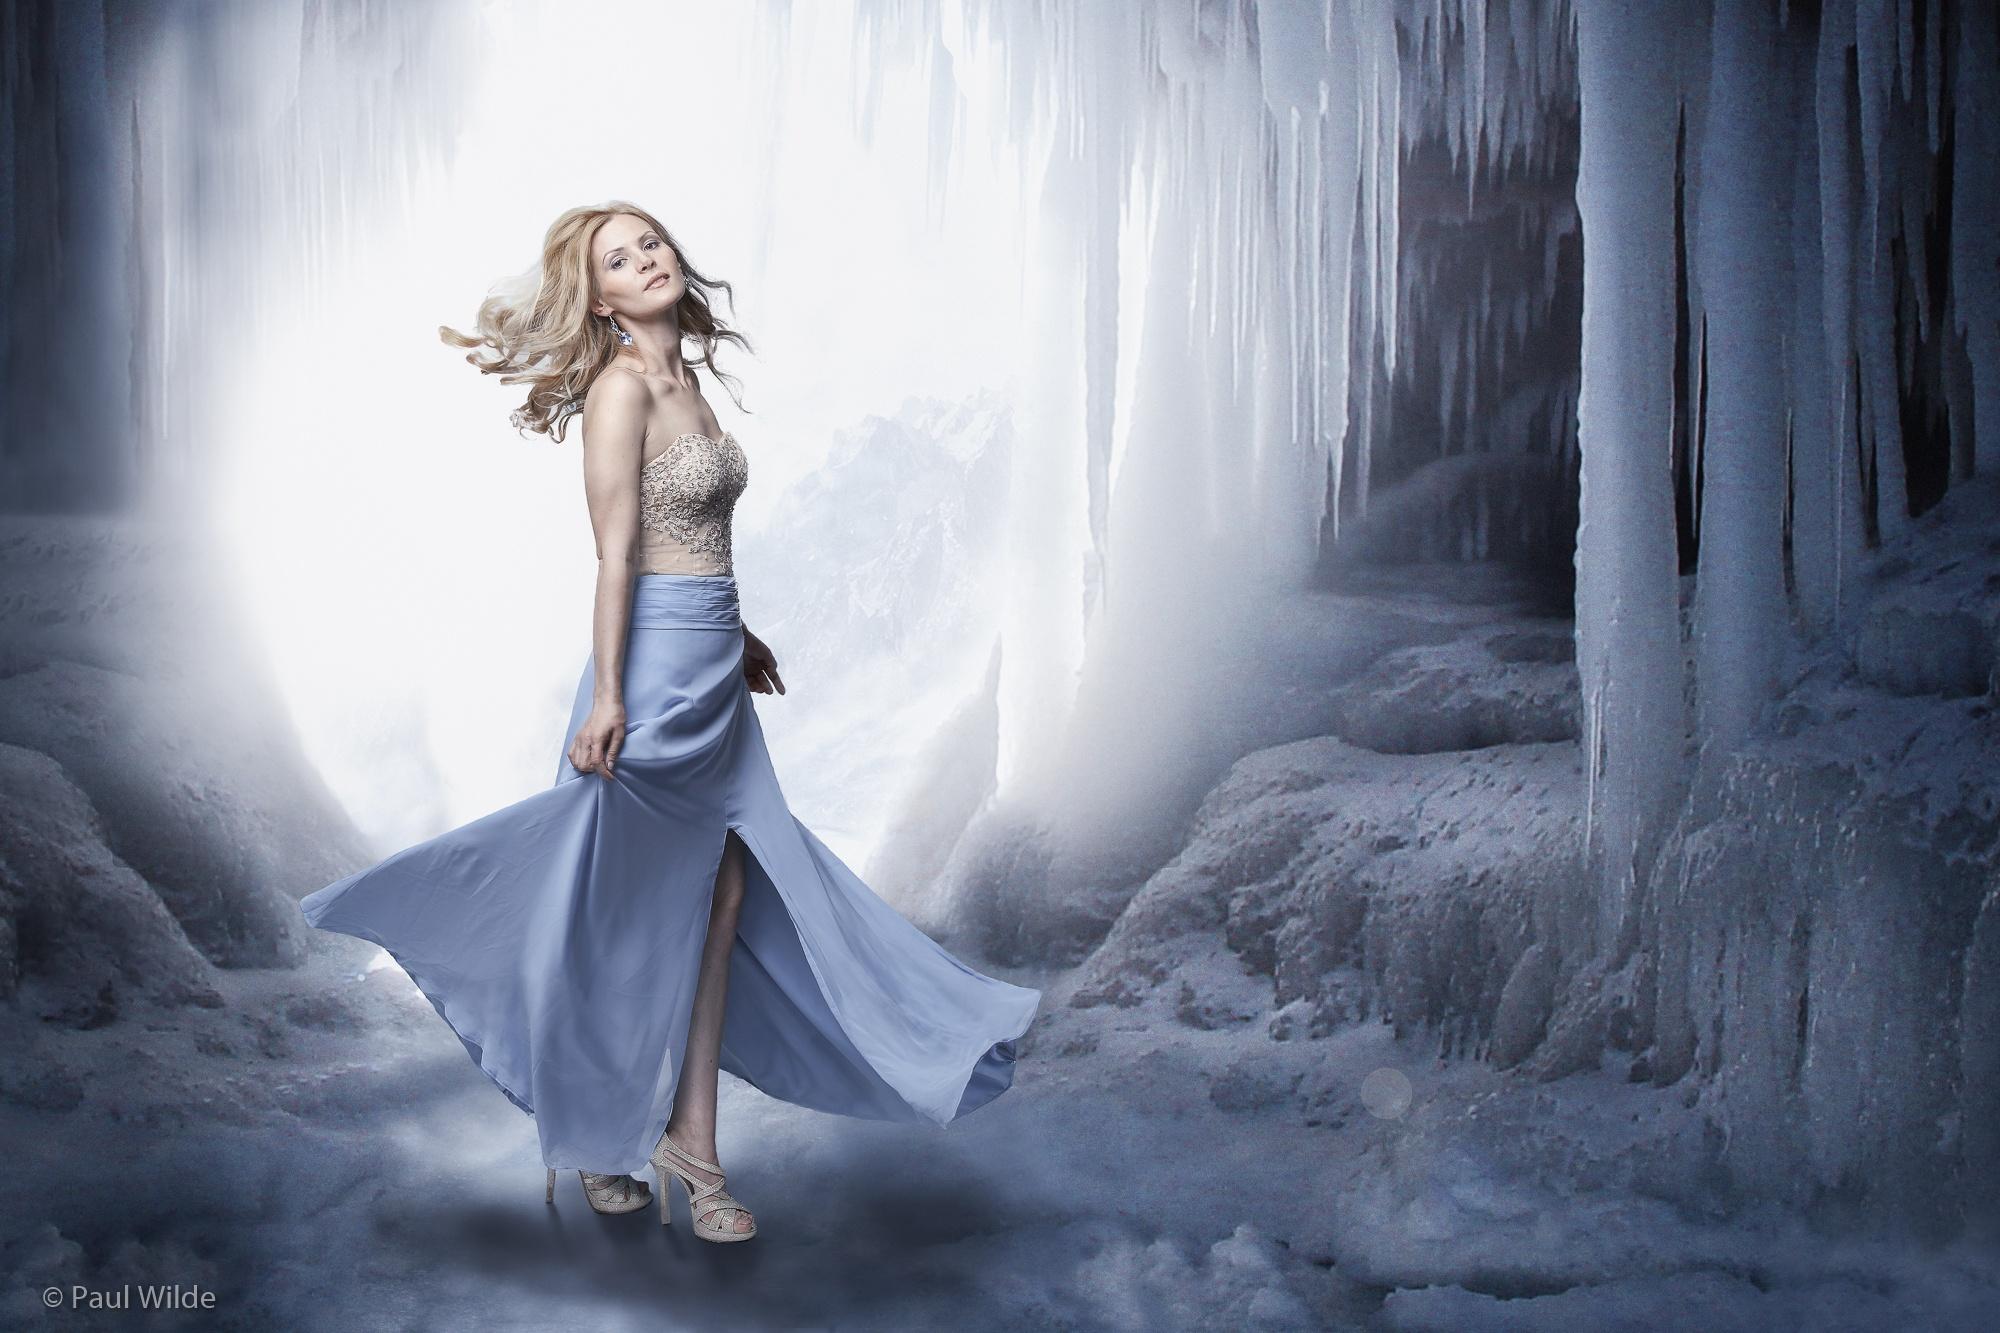 Ice Cave by P A U L W I L D E